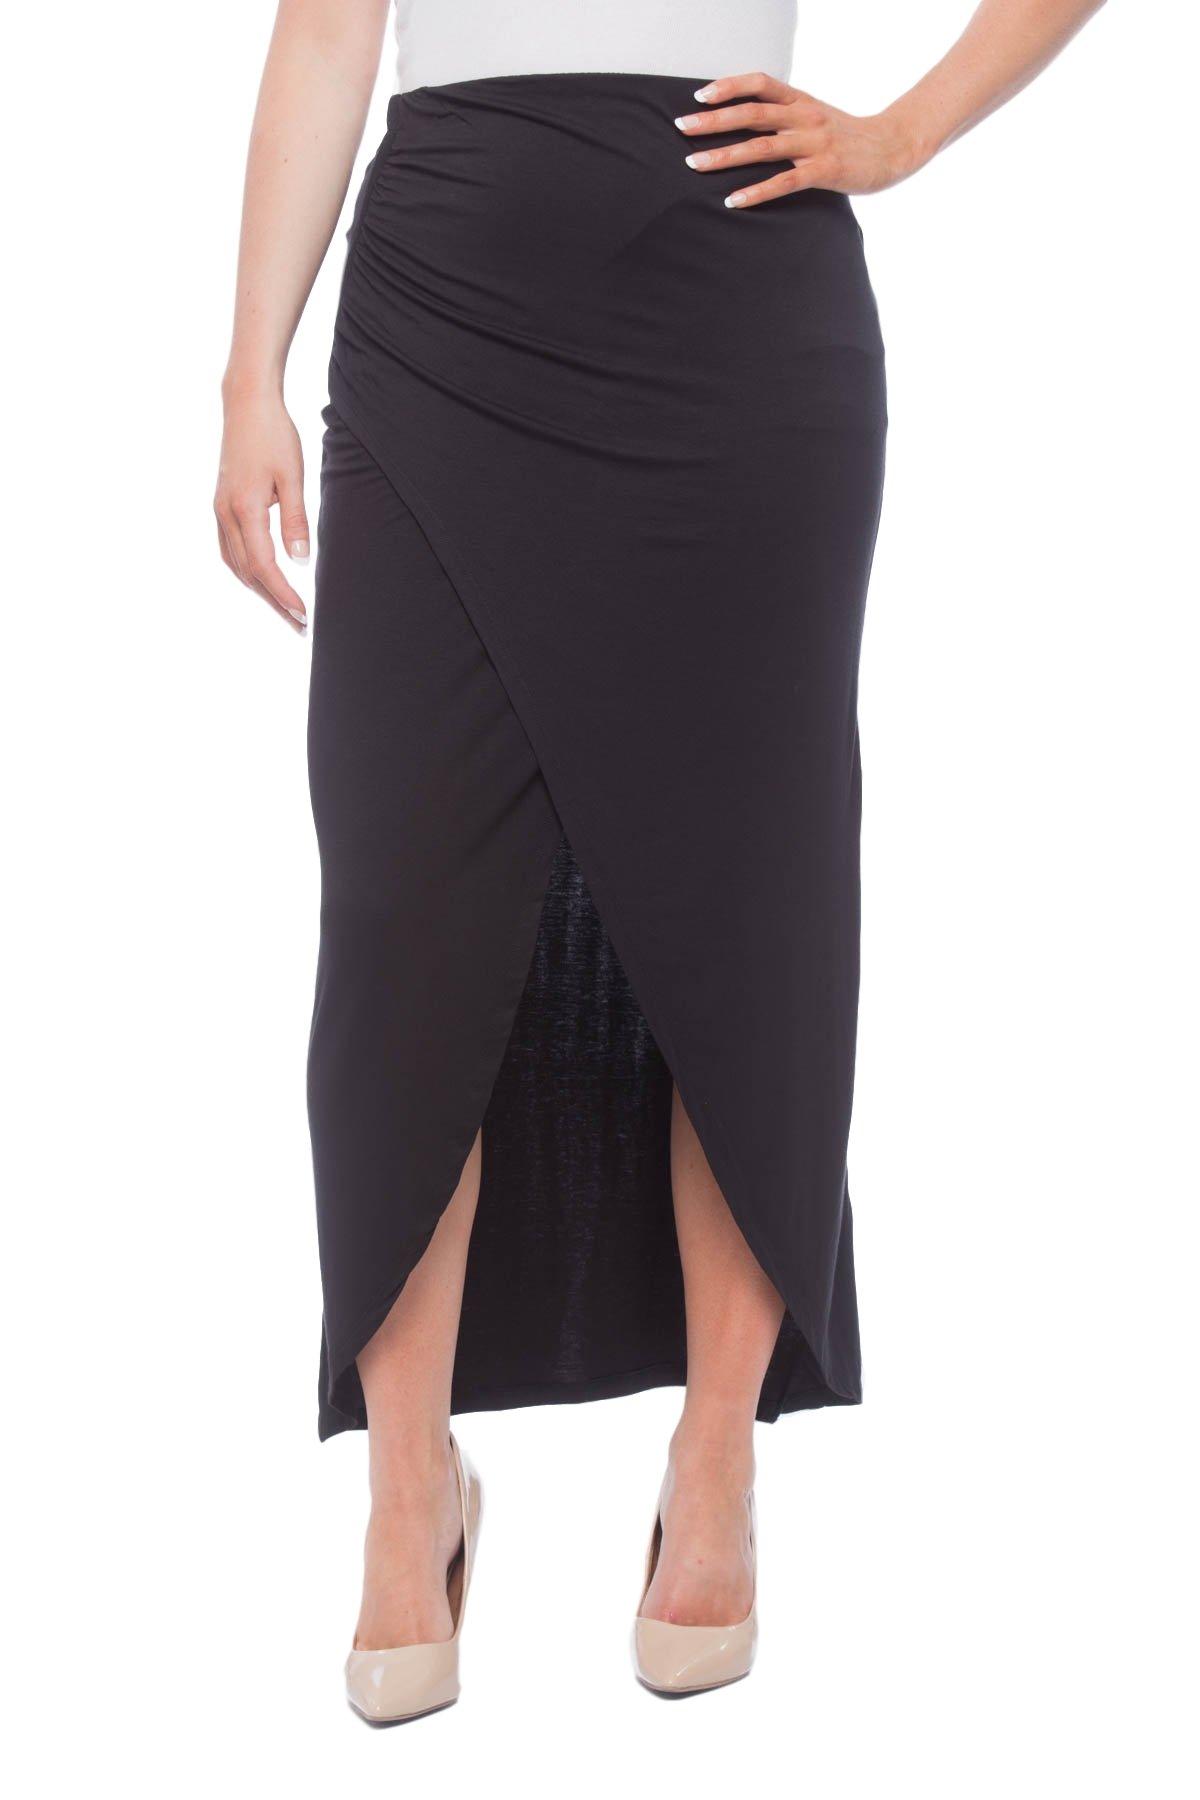 New York & Company Women's Wrap style Maxi Skirt Black M